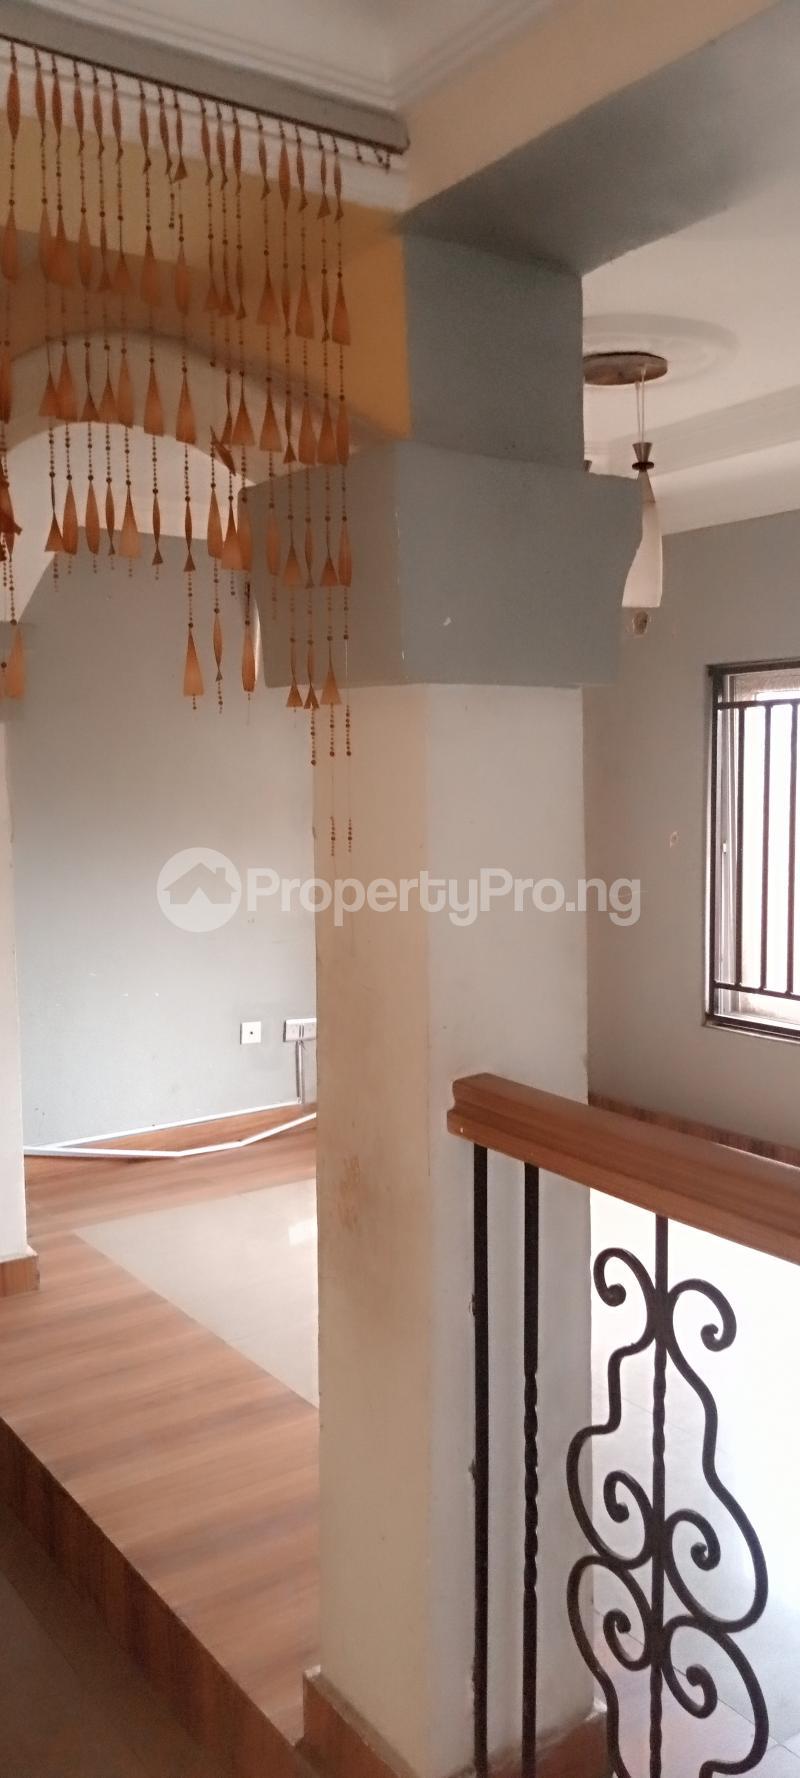 5 bedroom House for rent Estate drive Omole phase 2 Ojodu Lagos - 0